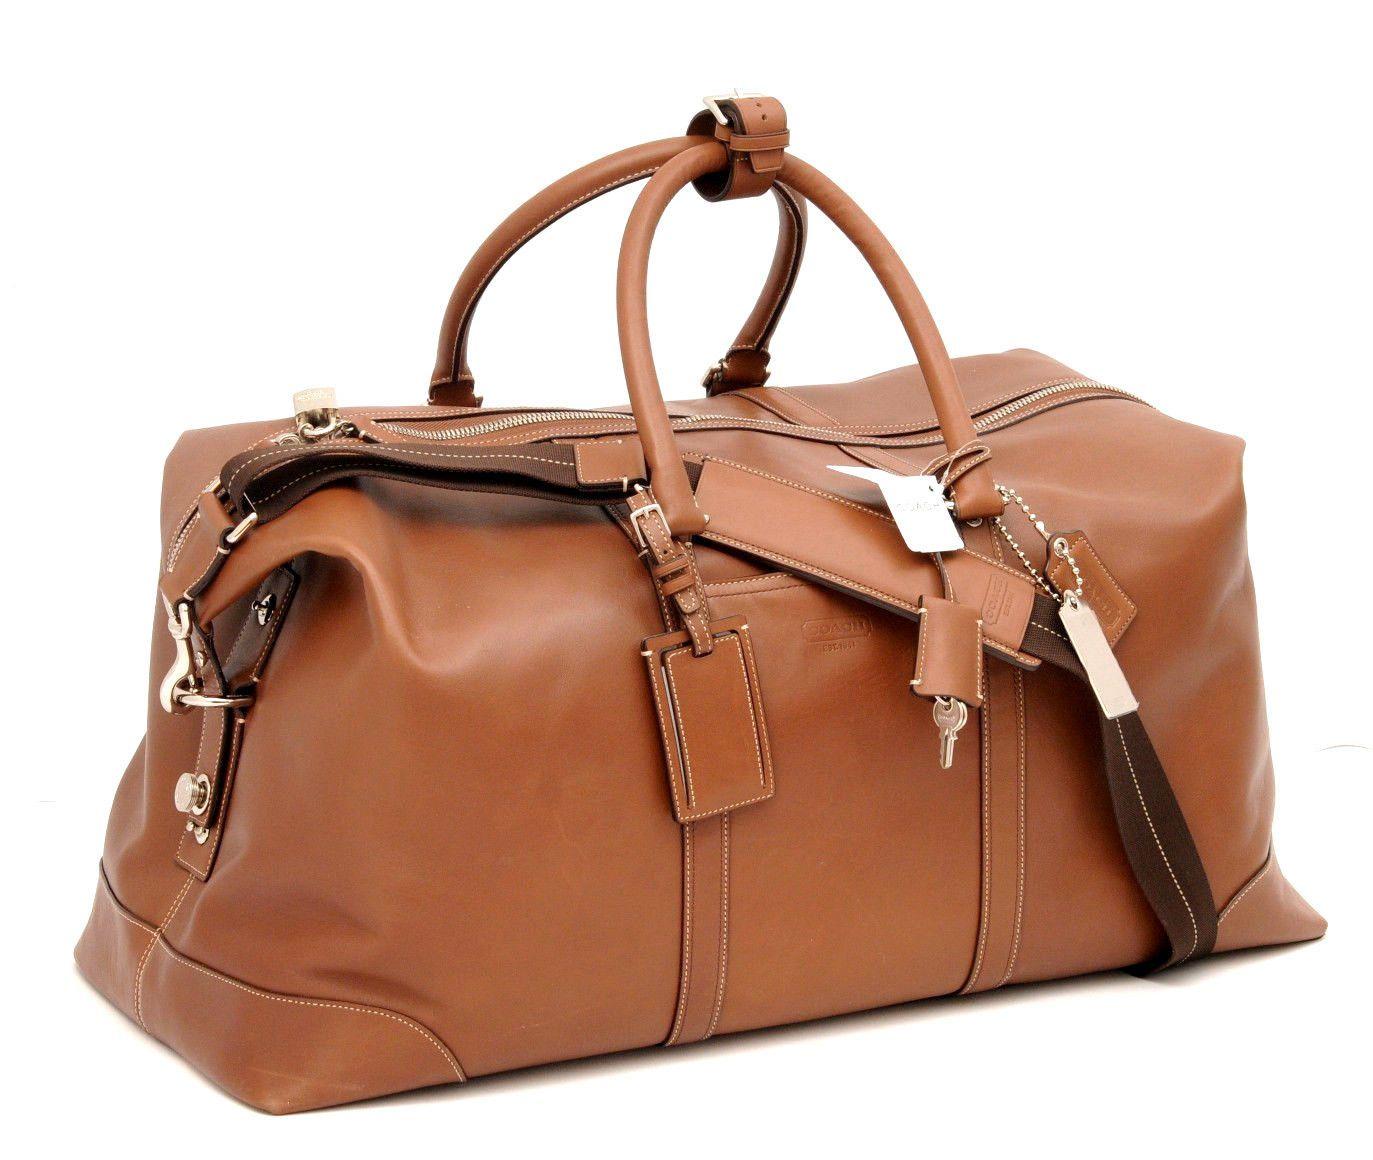 61e61687a3 Transatlantic Brown Leather Duffle Bag by Coach